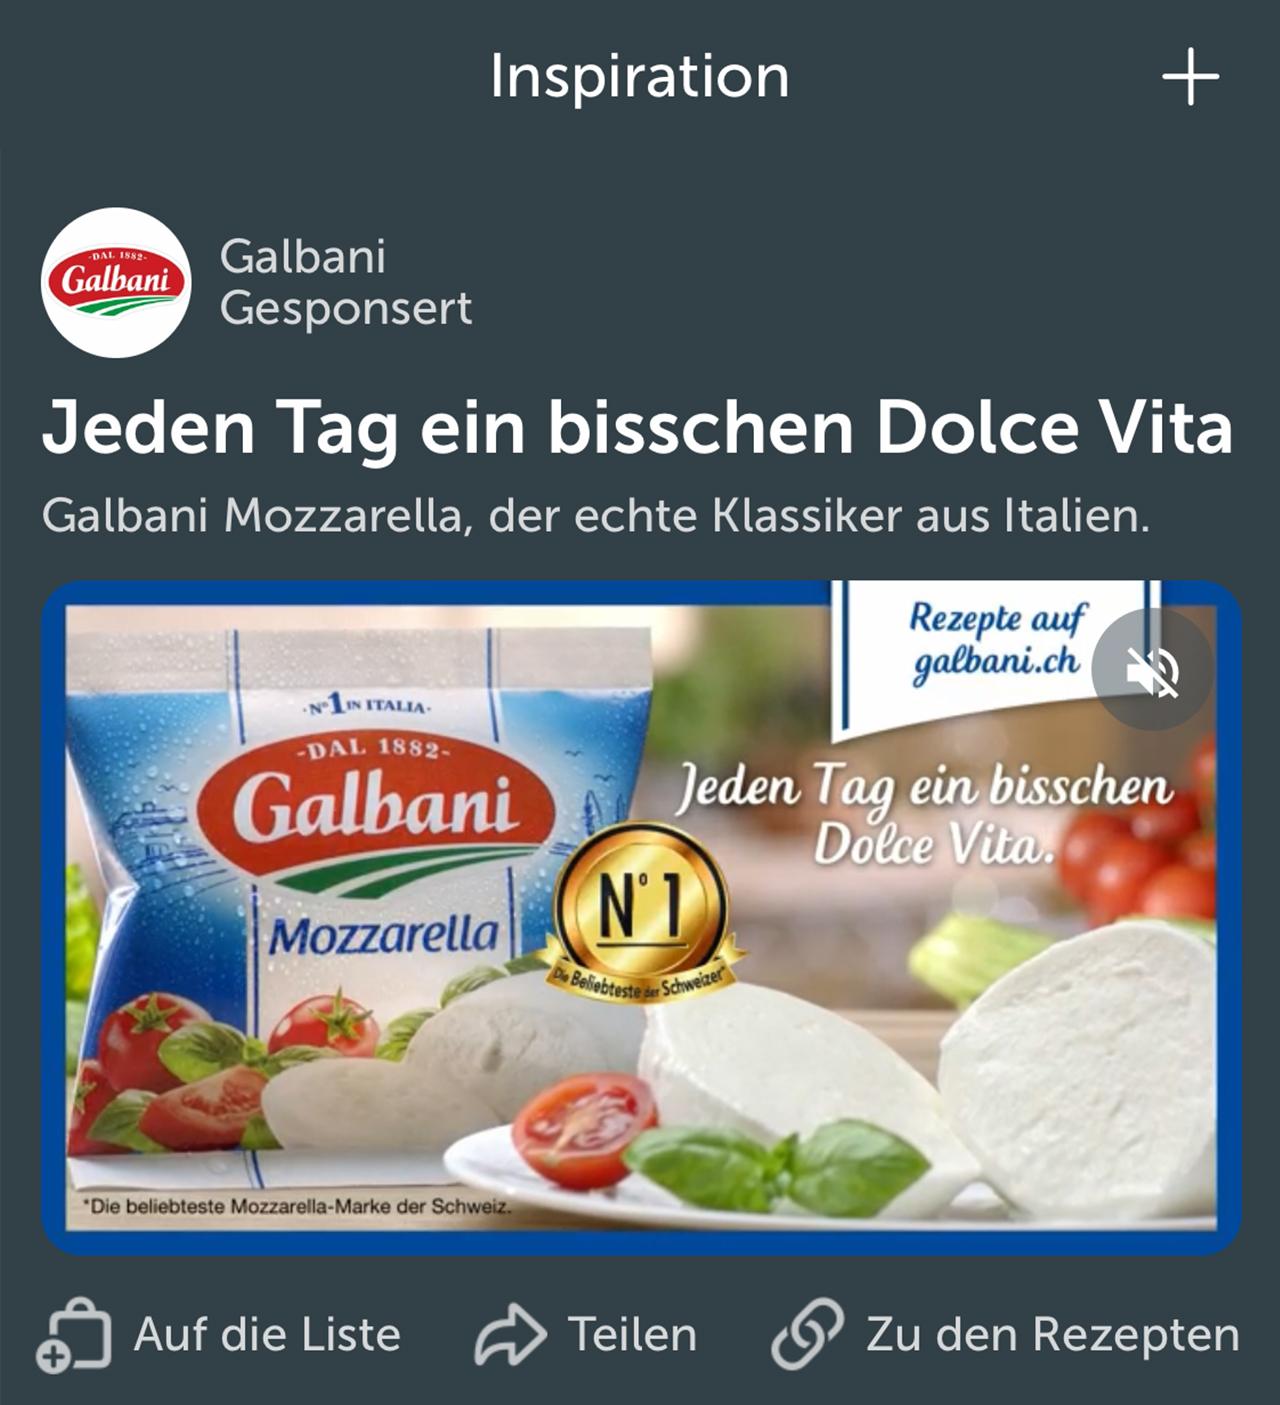 advertising-bring-app-sposored-video-galbani